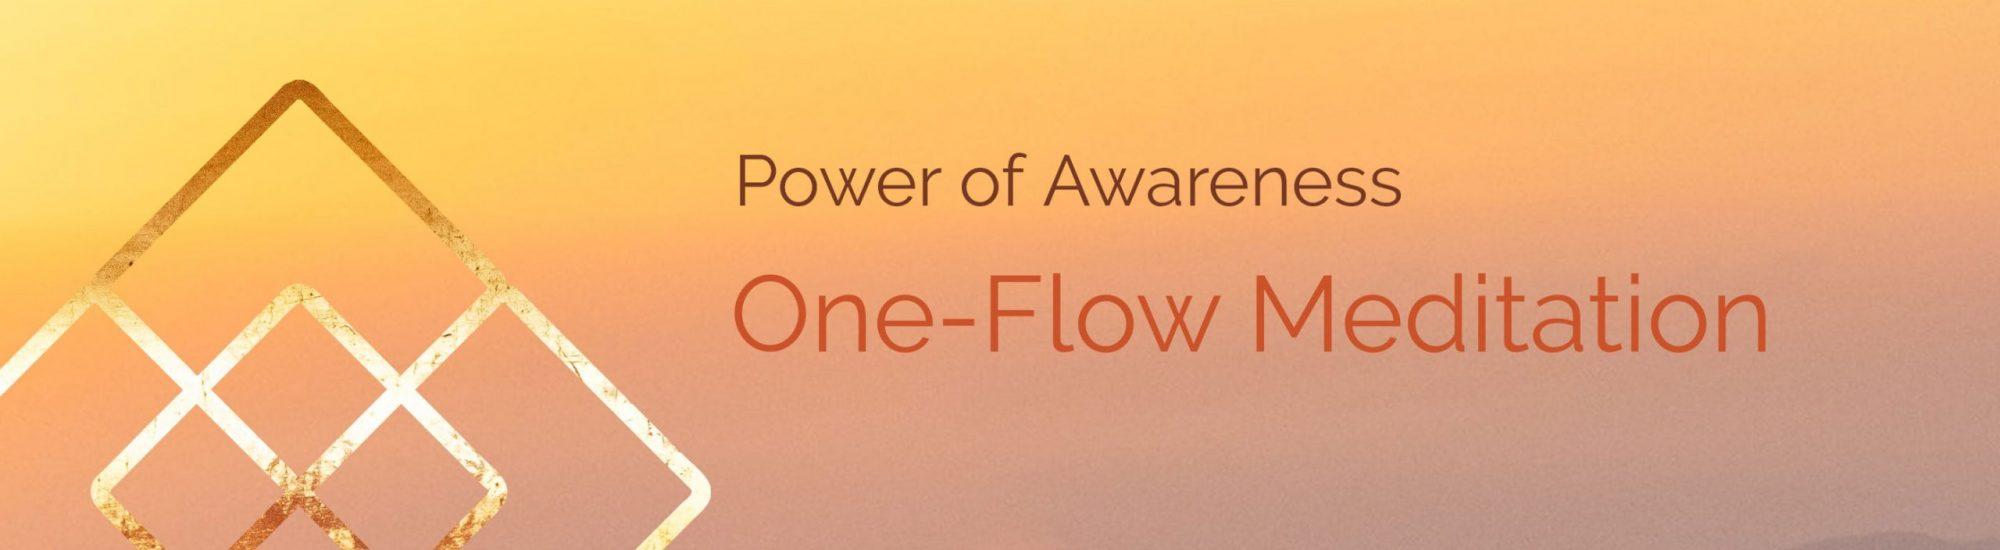 one-flow-meditation_banner_2000x560